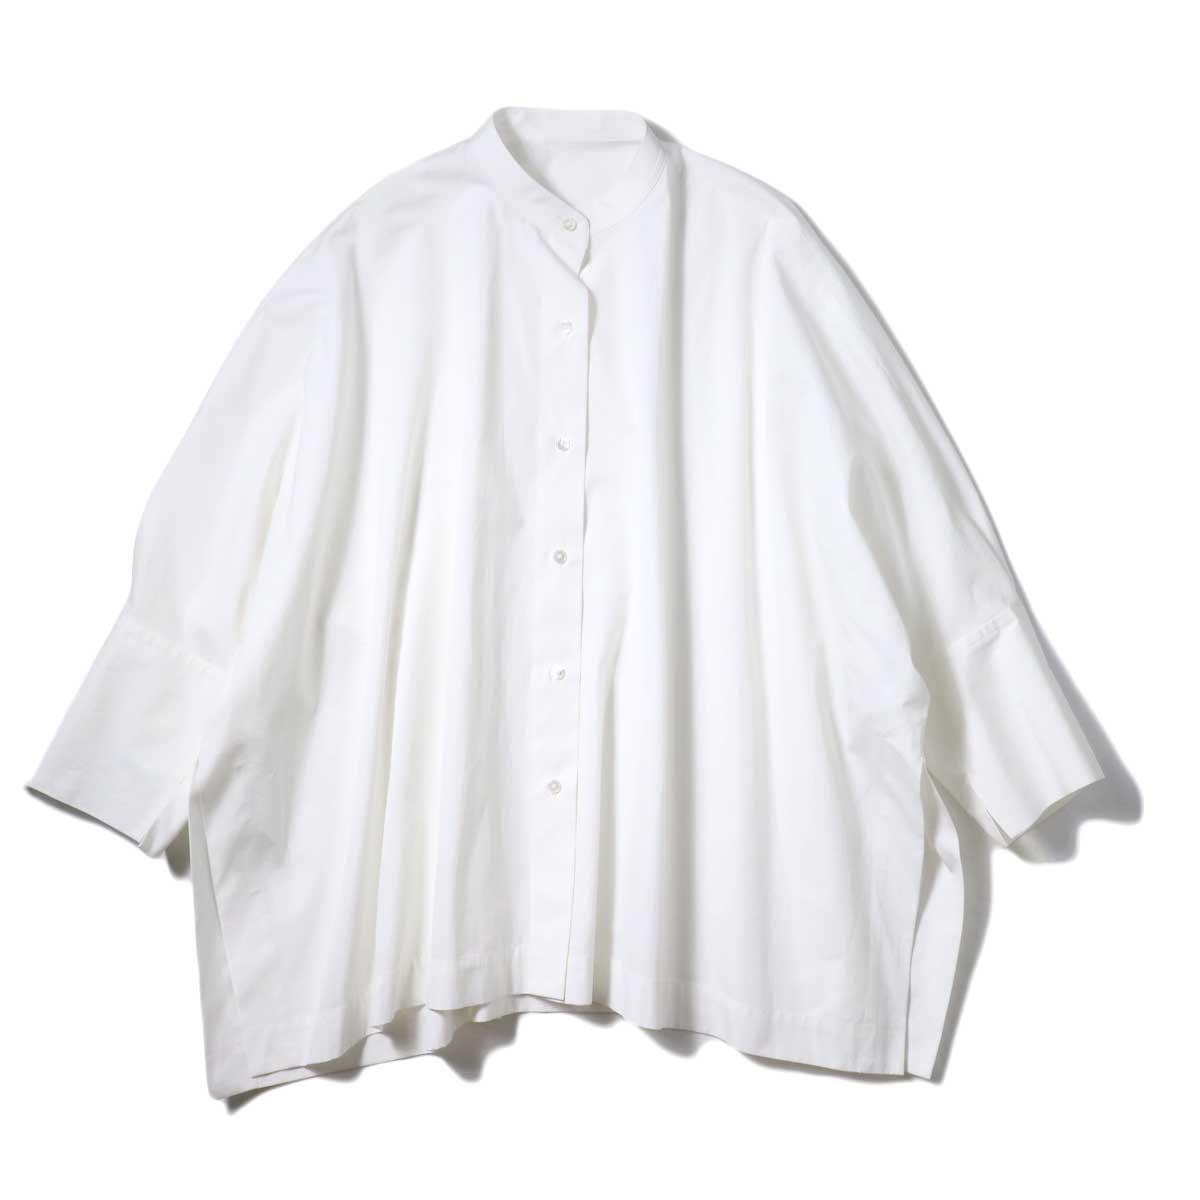 YLEVE / COTTON TYPEW RITER BIG SHIRT (White)